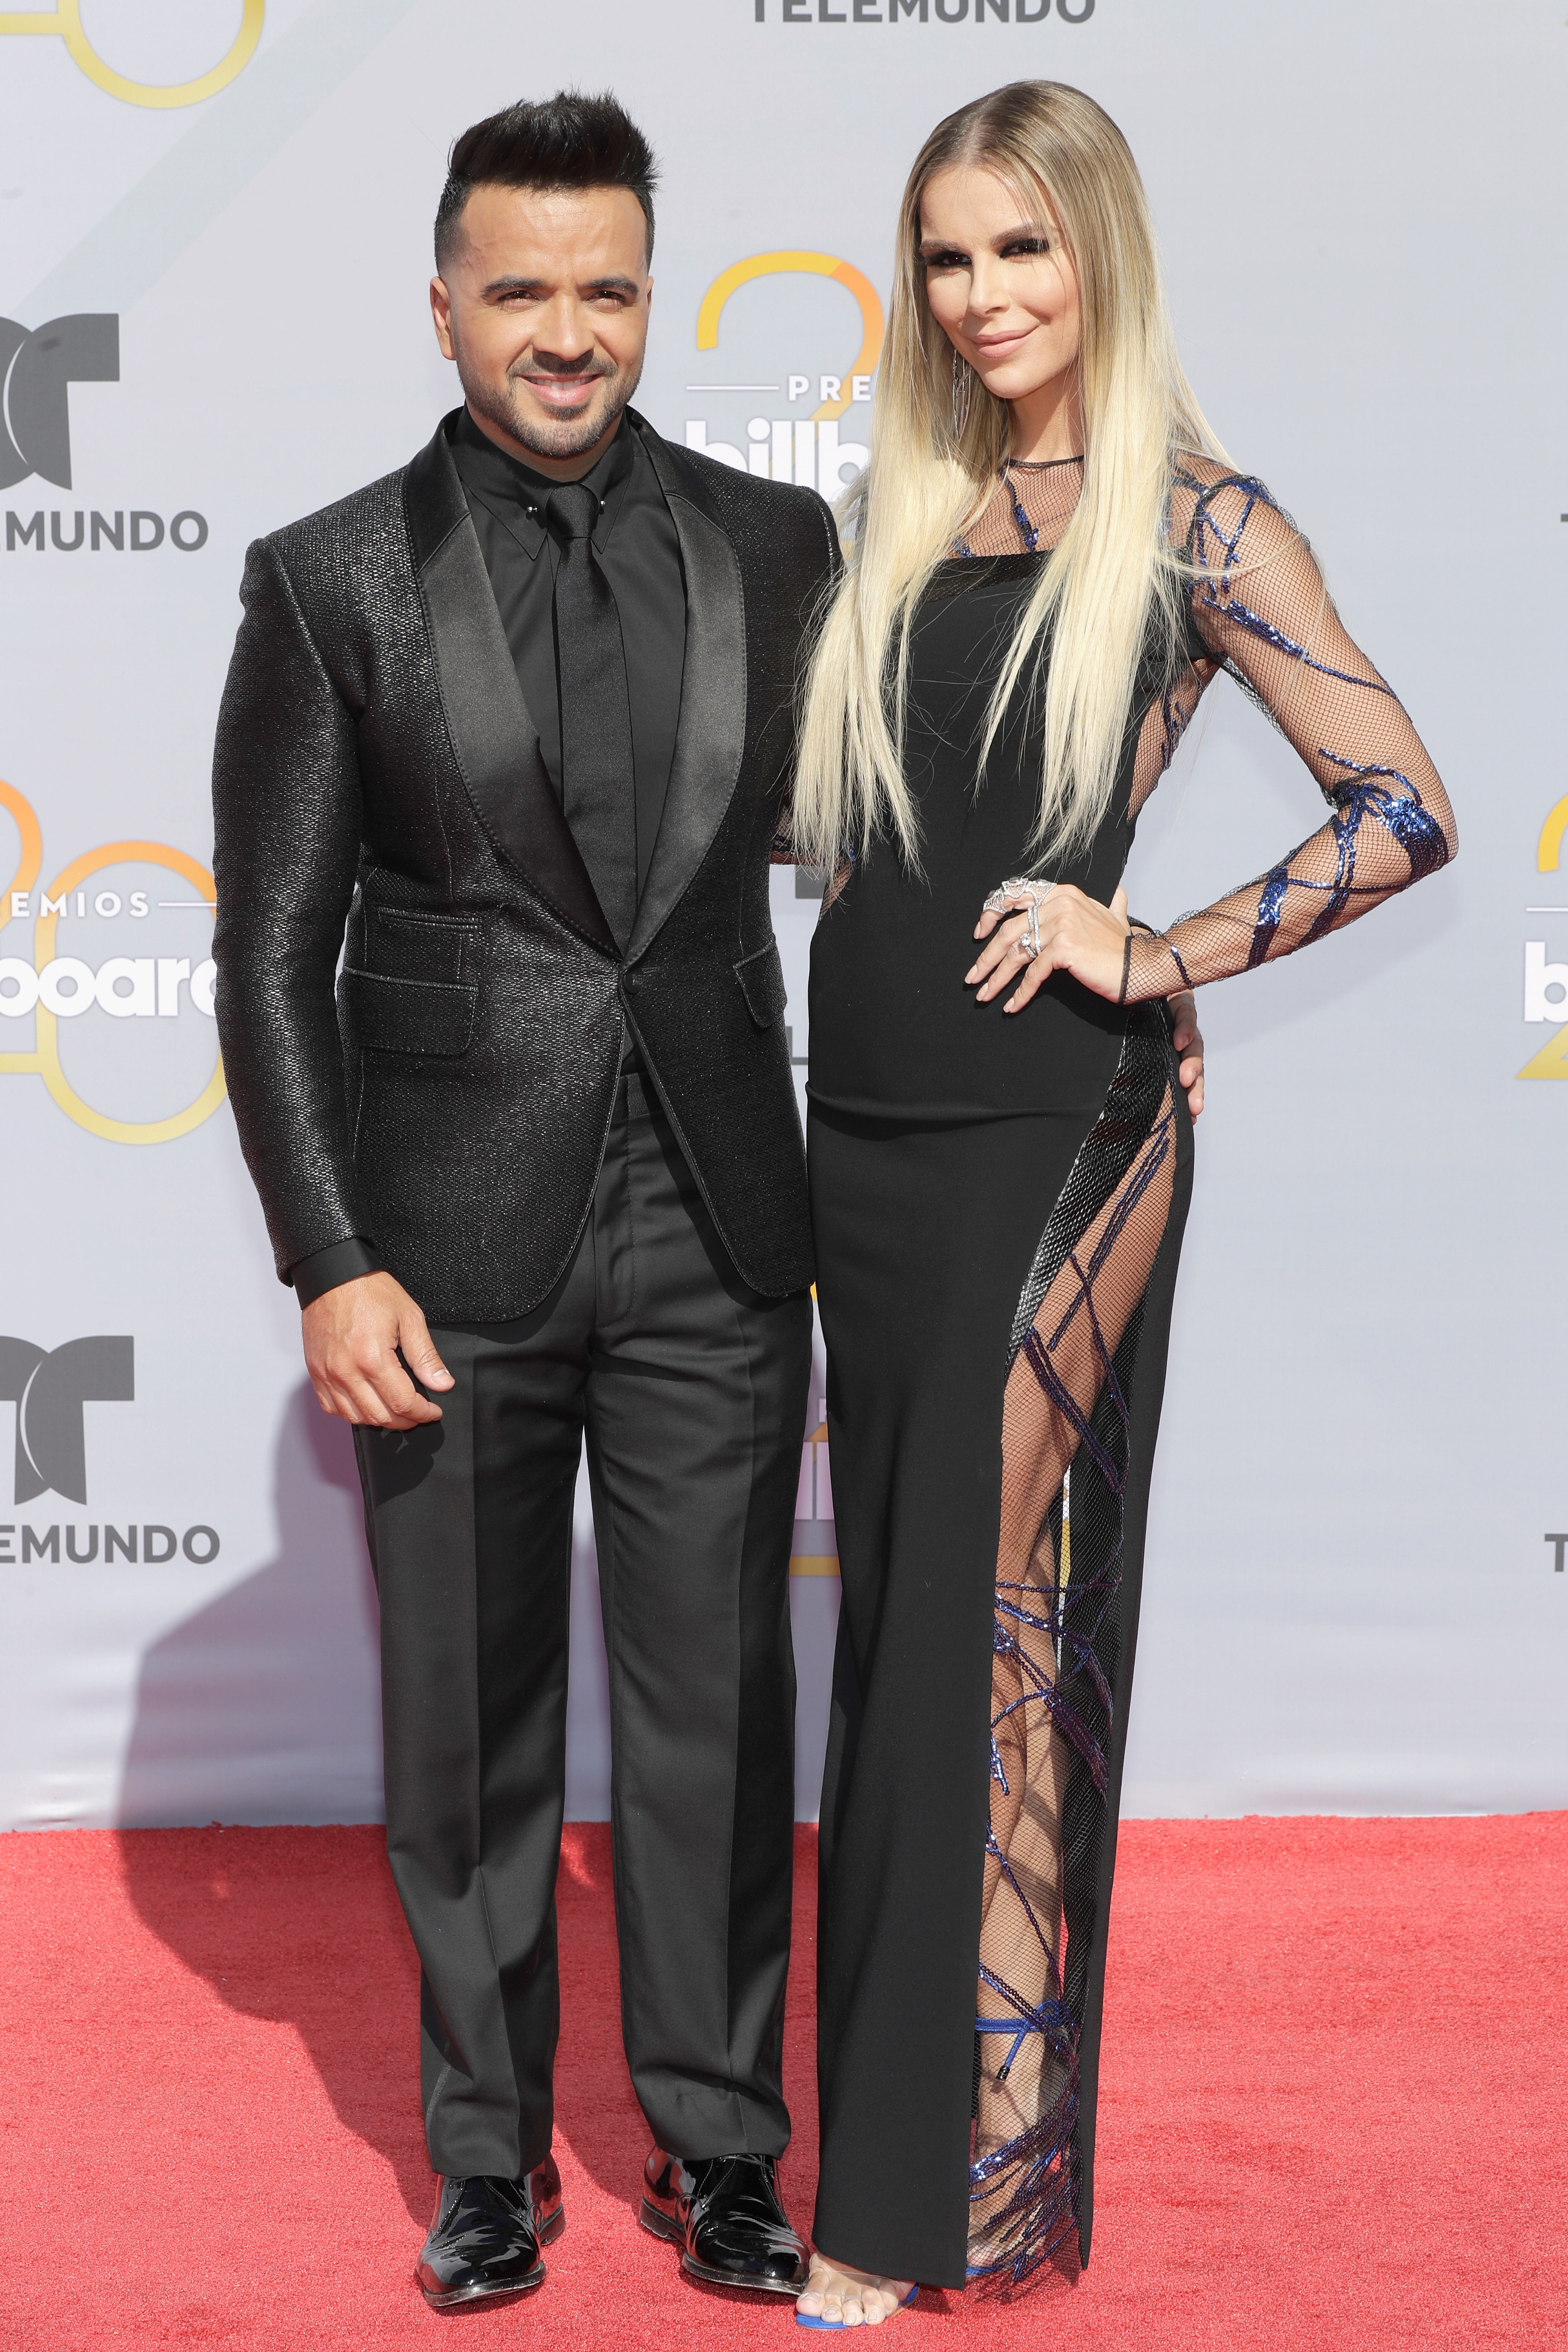 Latin Billboards 2018, premios, looks, vestidos